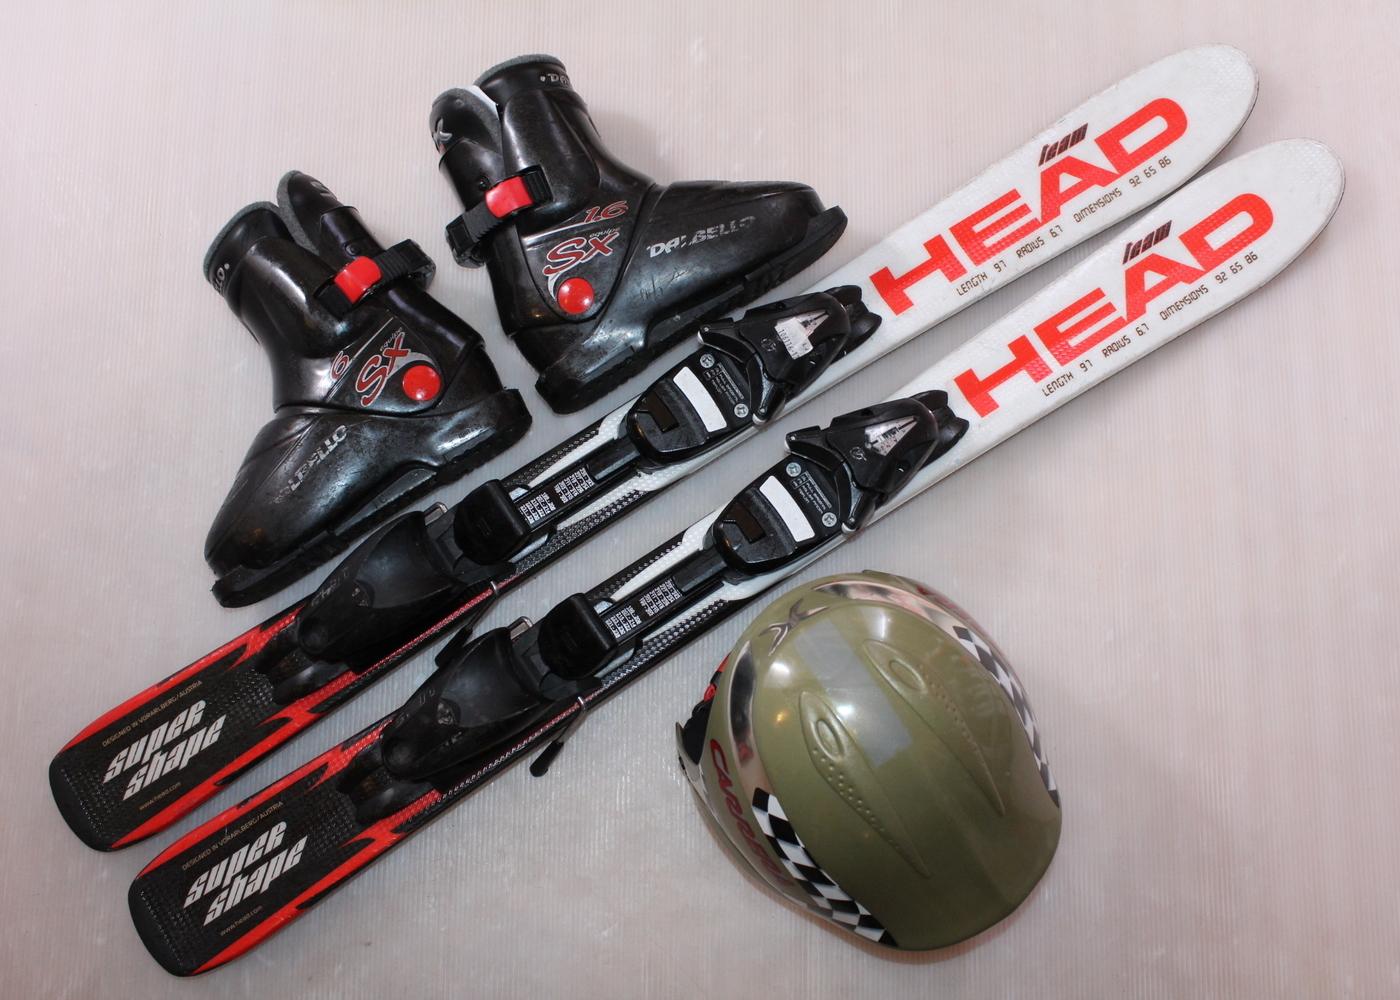 Dětské lyže HEAD SUPERSHAPE TEAM 100 cm + lyžáky  30.5EU + helma